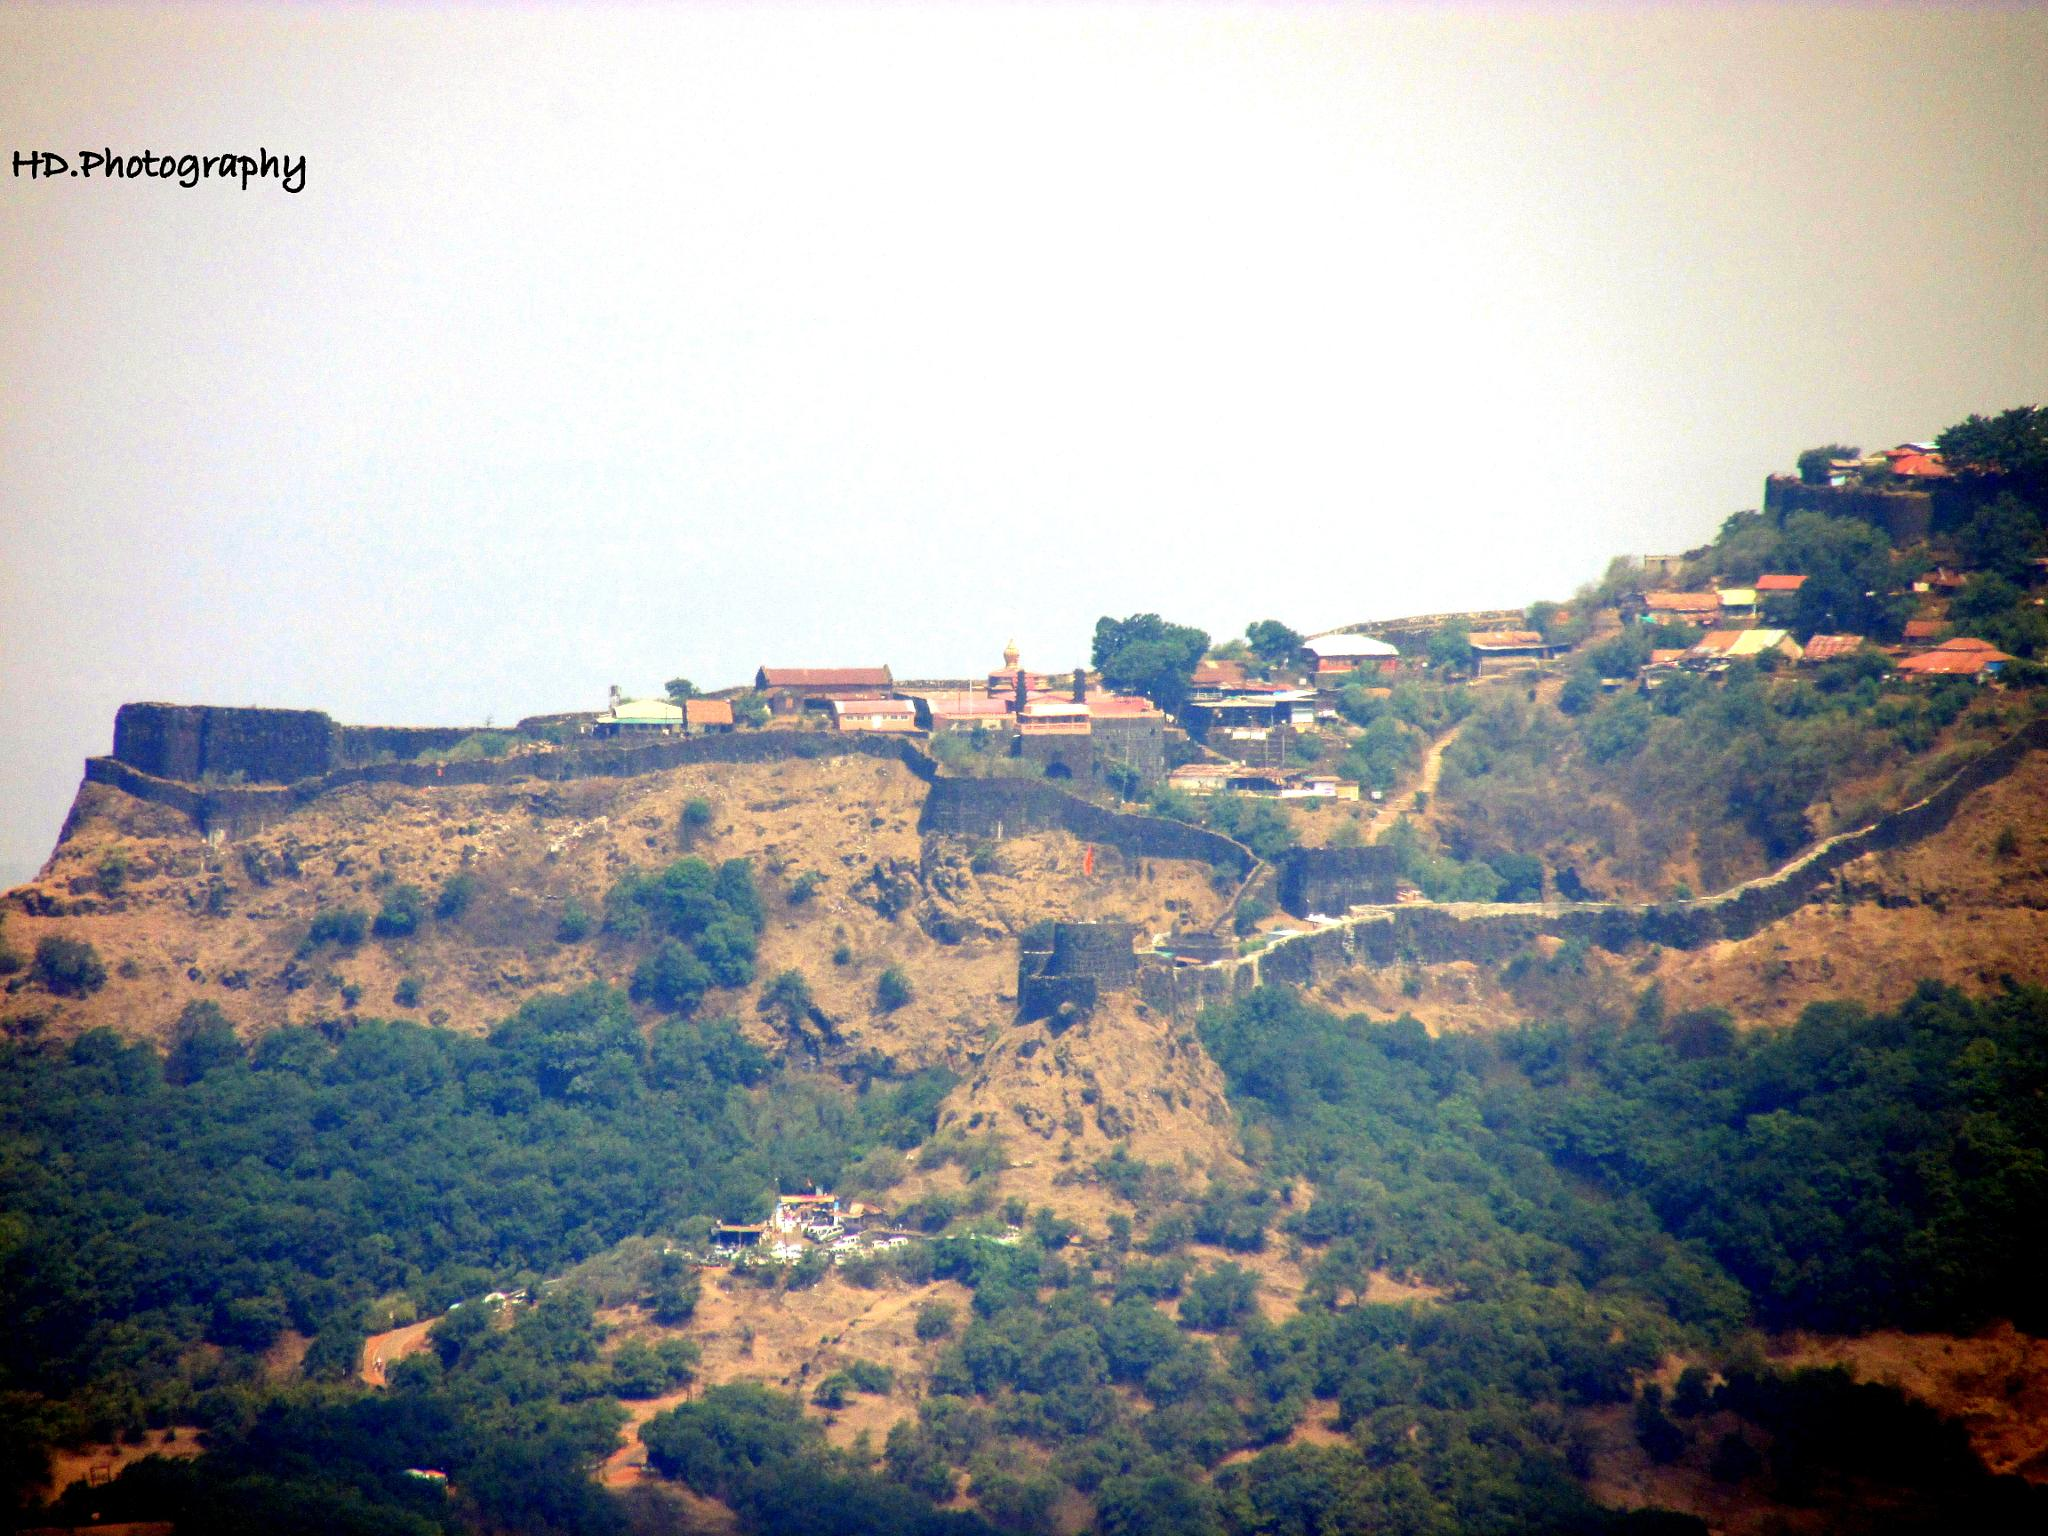 Fort .... by Harshvardhaan Deshmukh